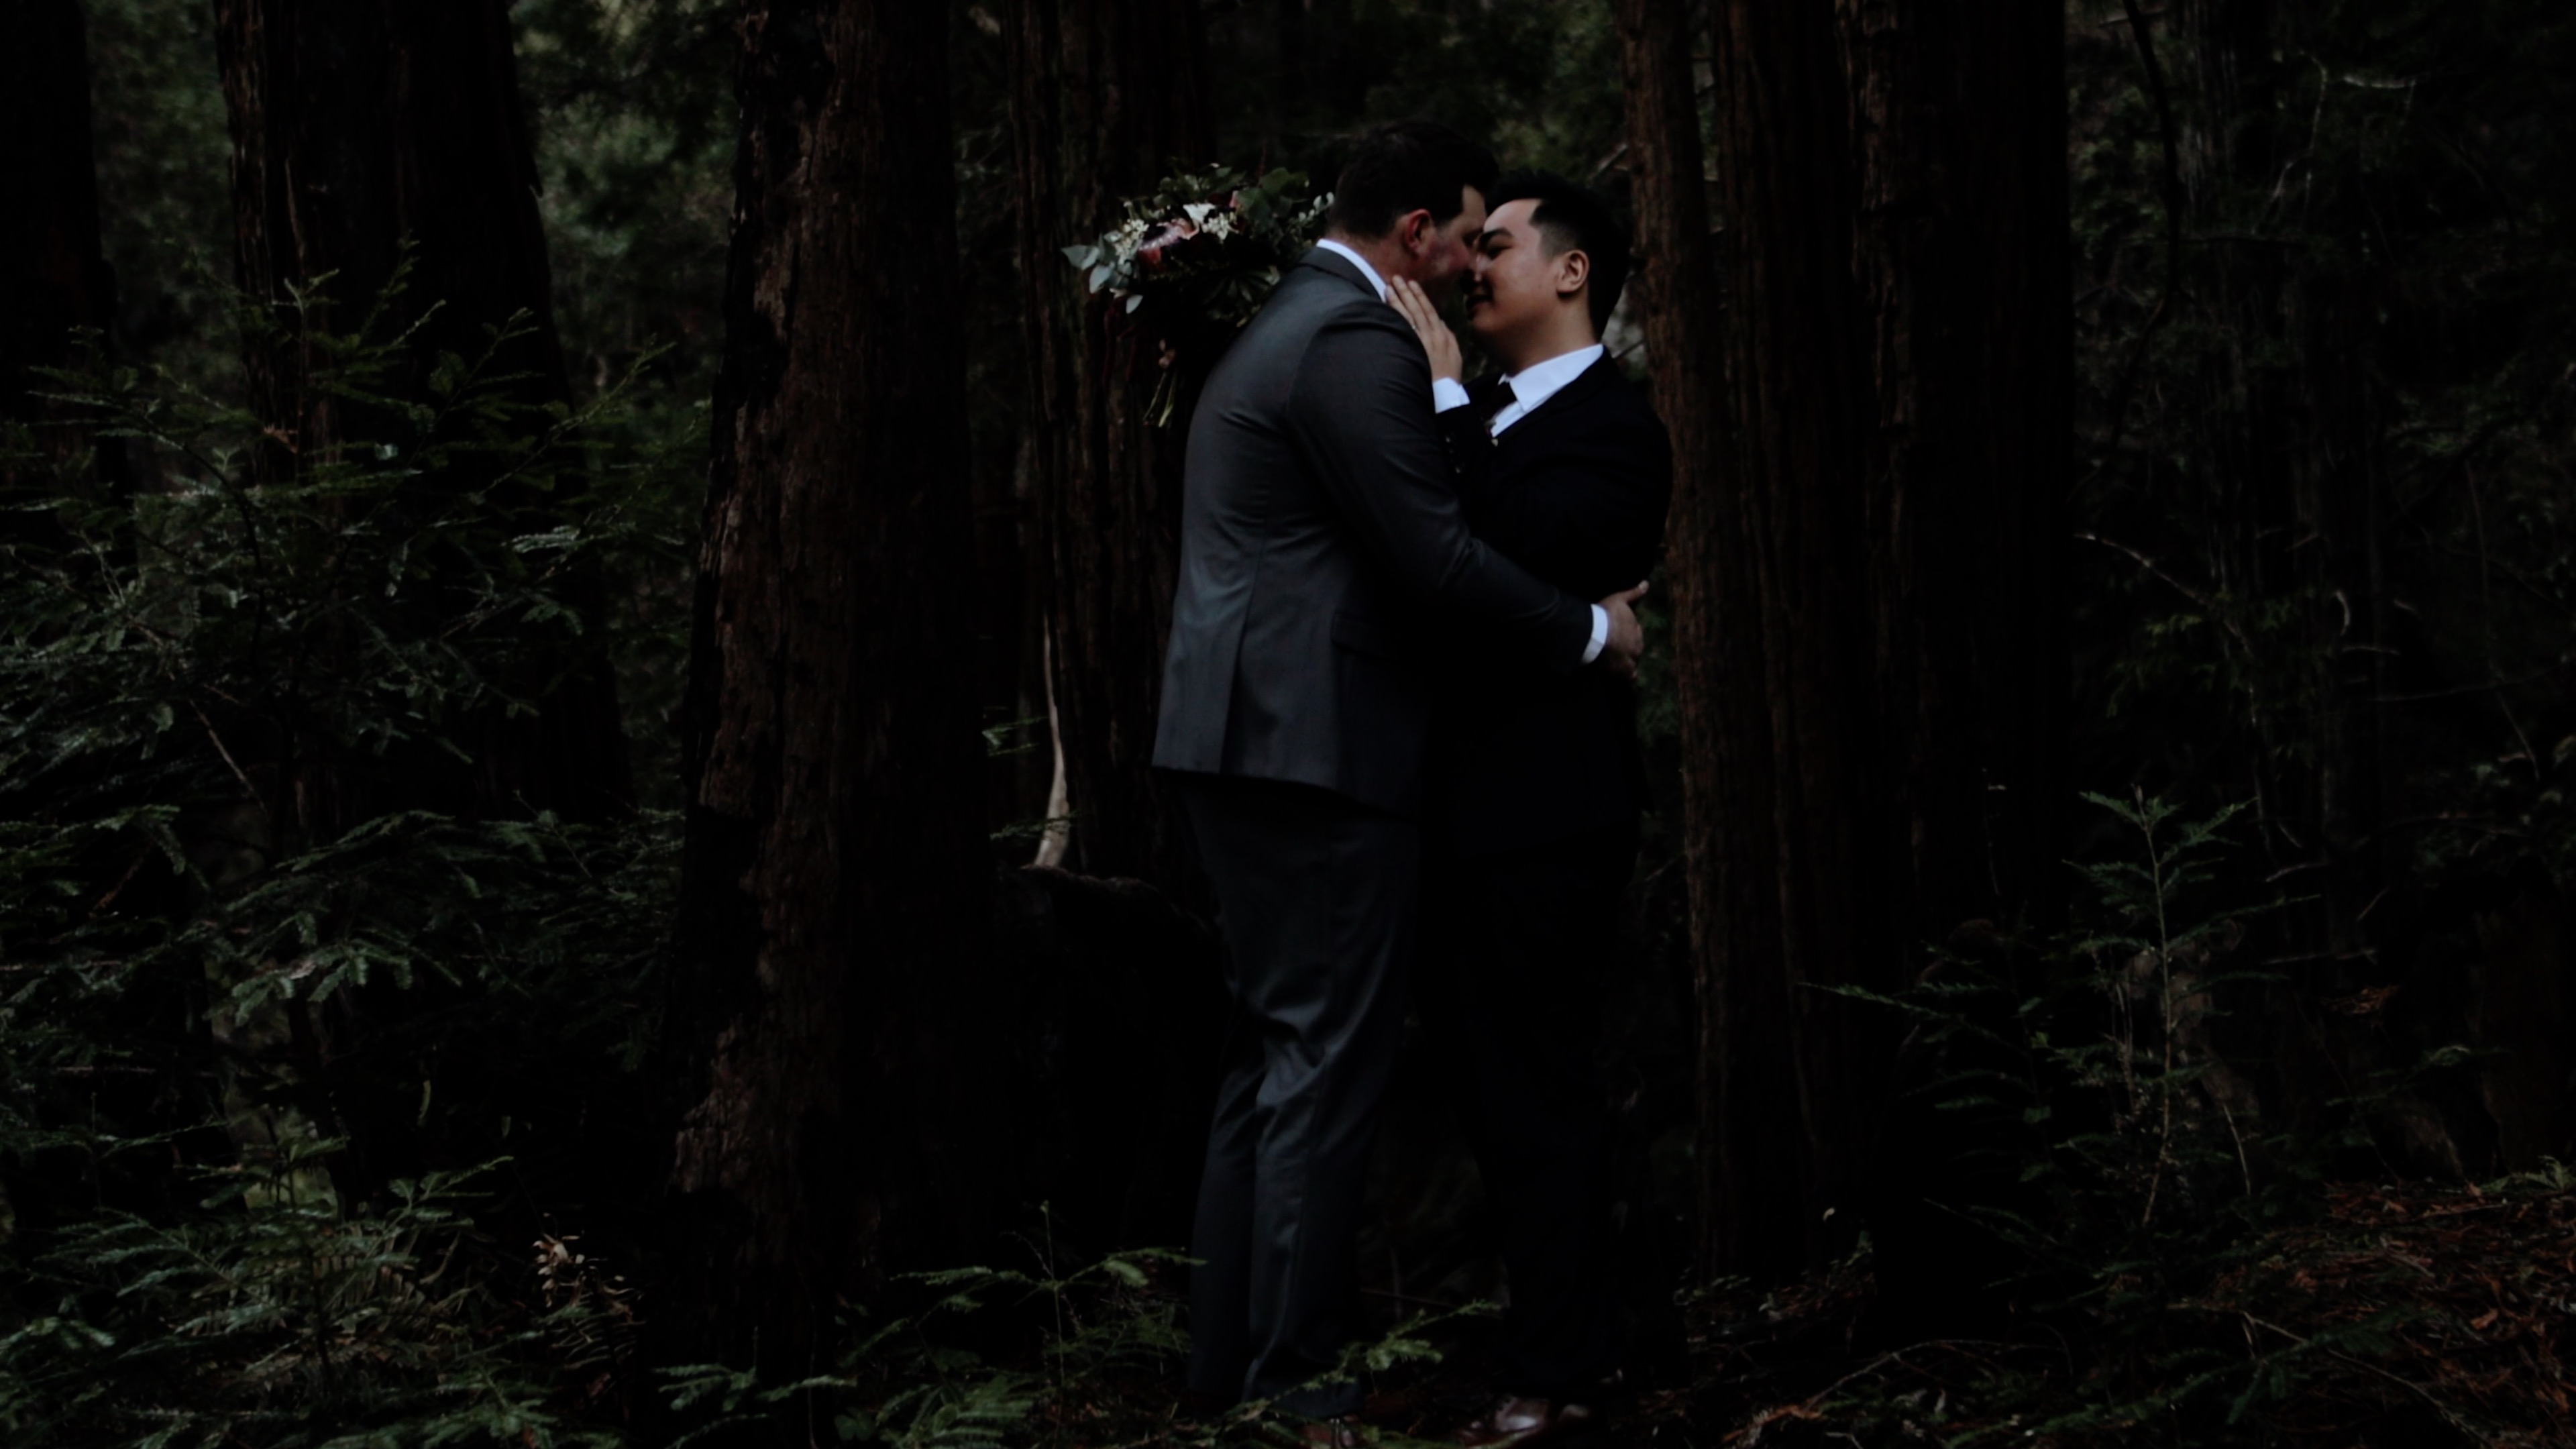 Gebriel + Ryne | Big Sur, California | Limekiln State Park